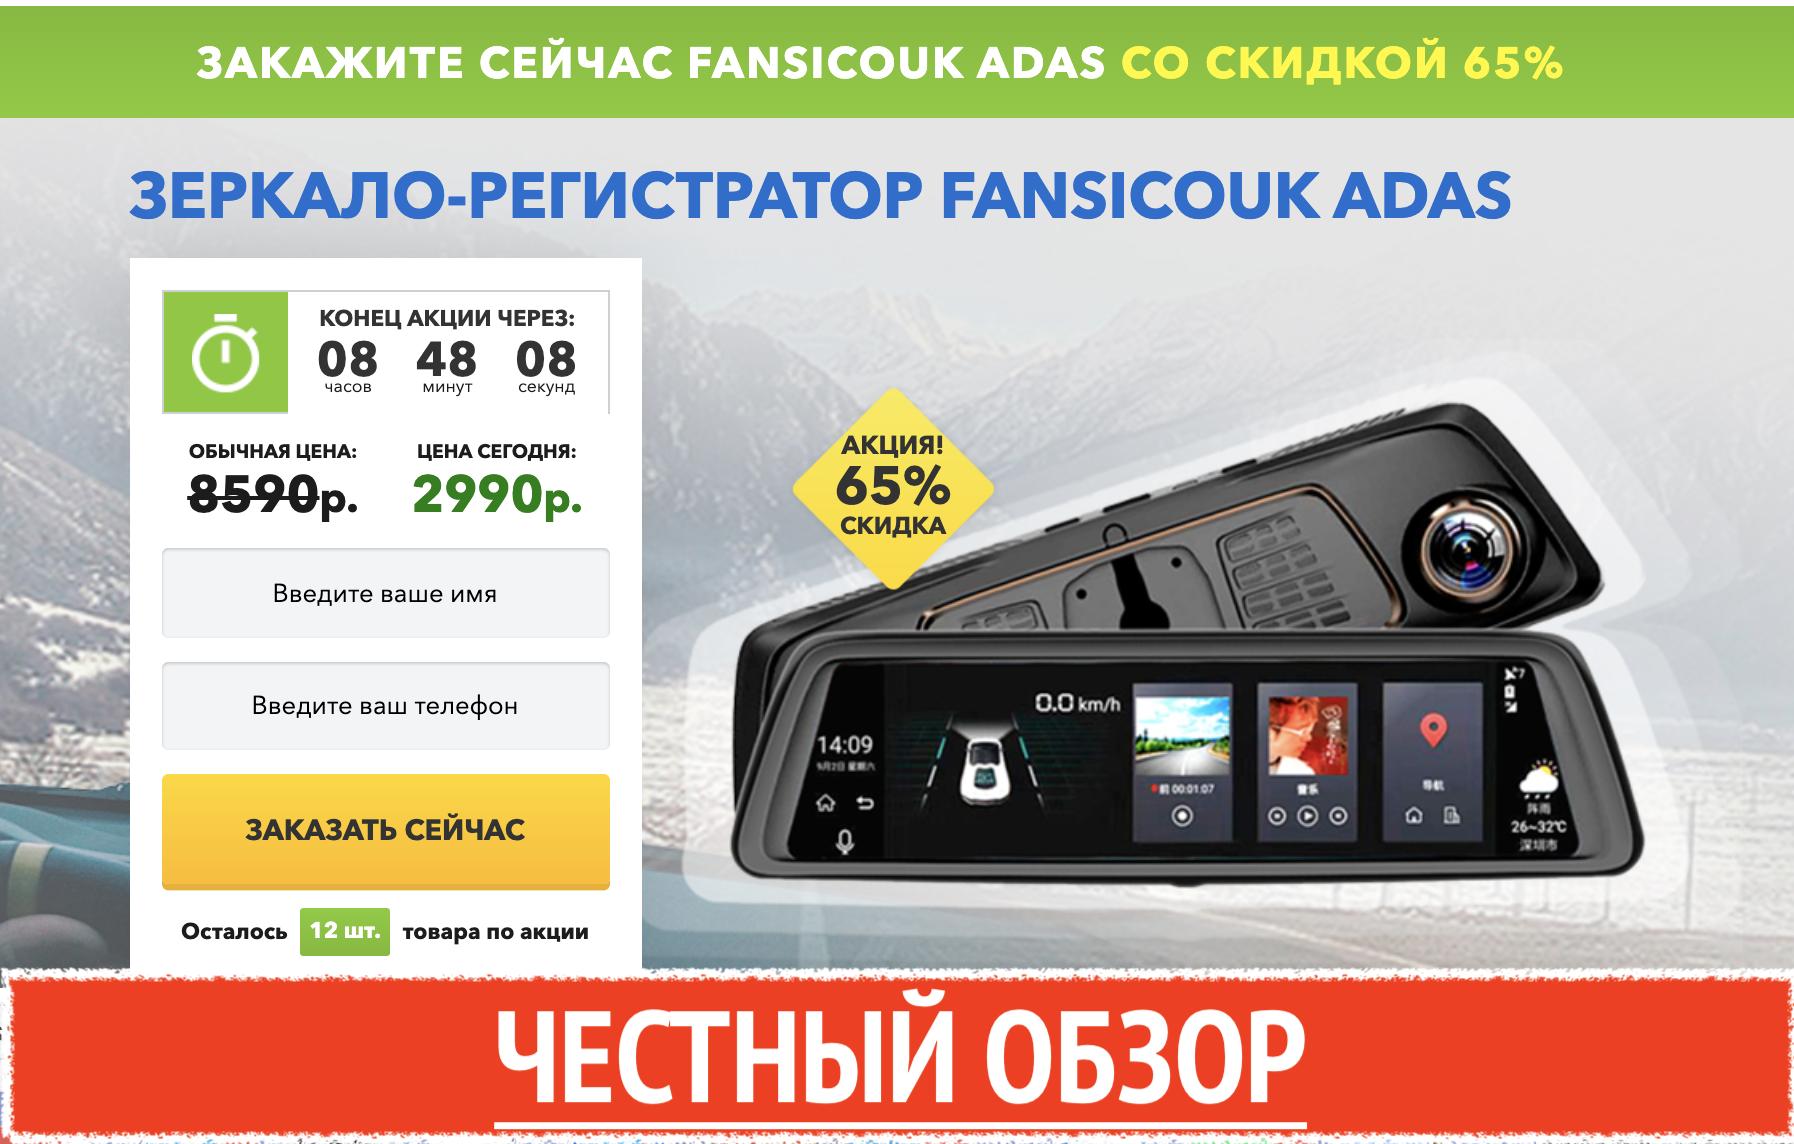 Зеркало-регистратор Fansicouk ADAS в Казалинске